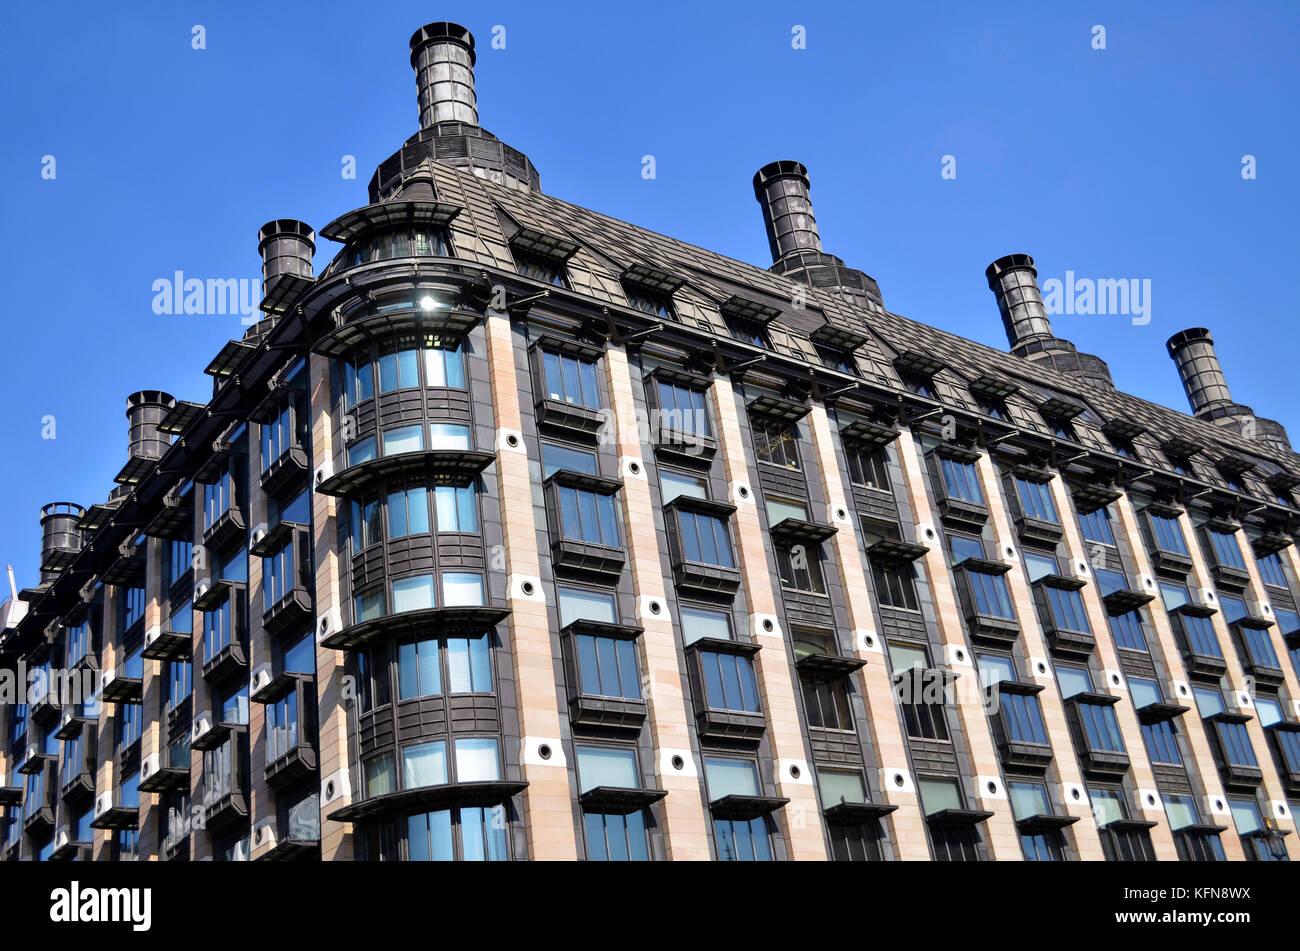 Portcullis House, Westminster, London, UK. - Stock Image